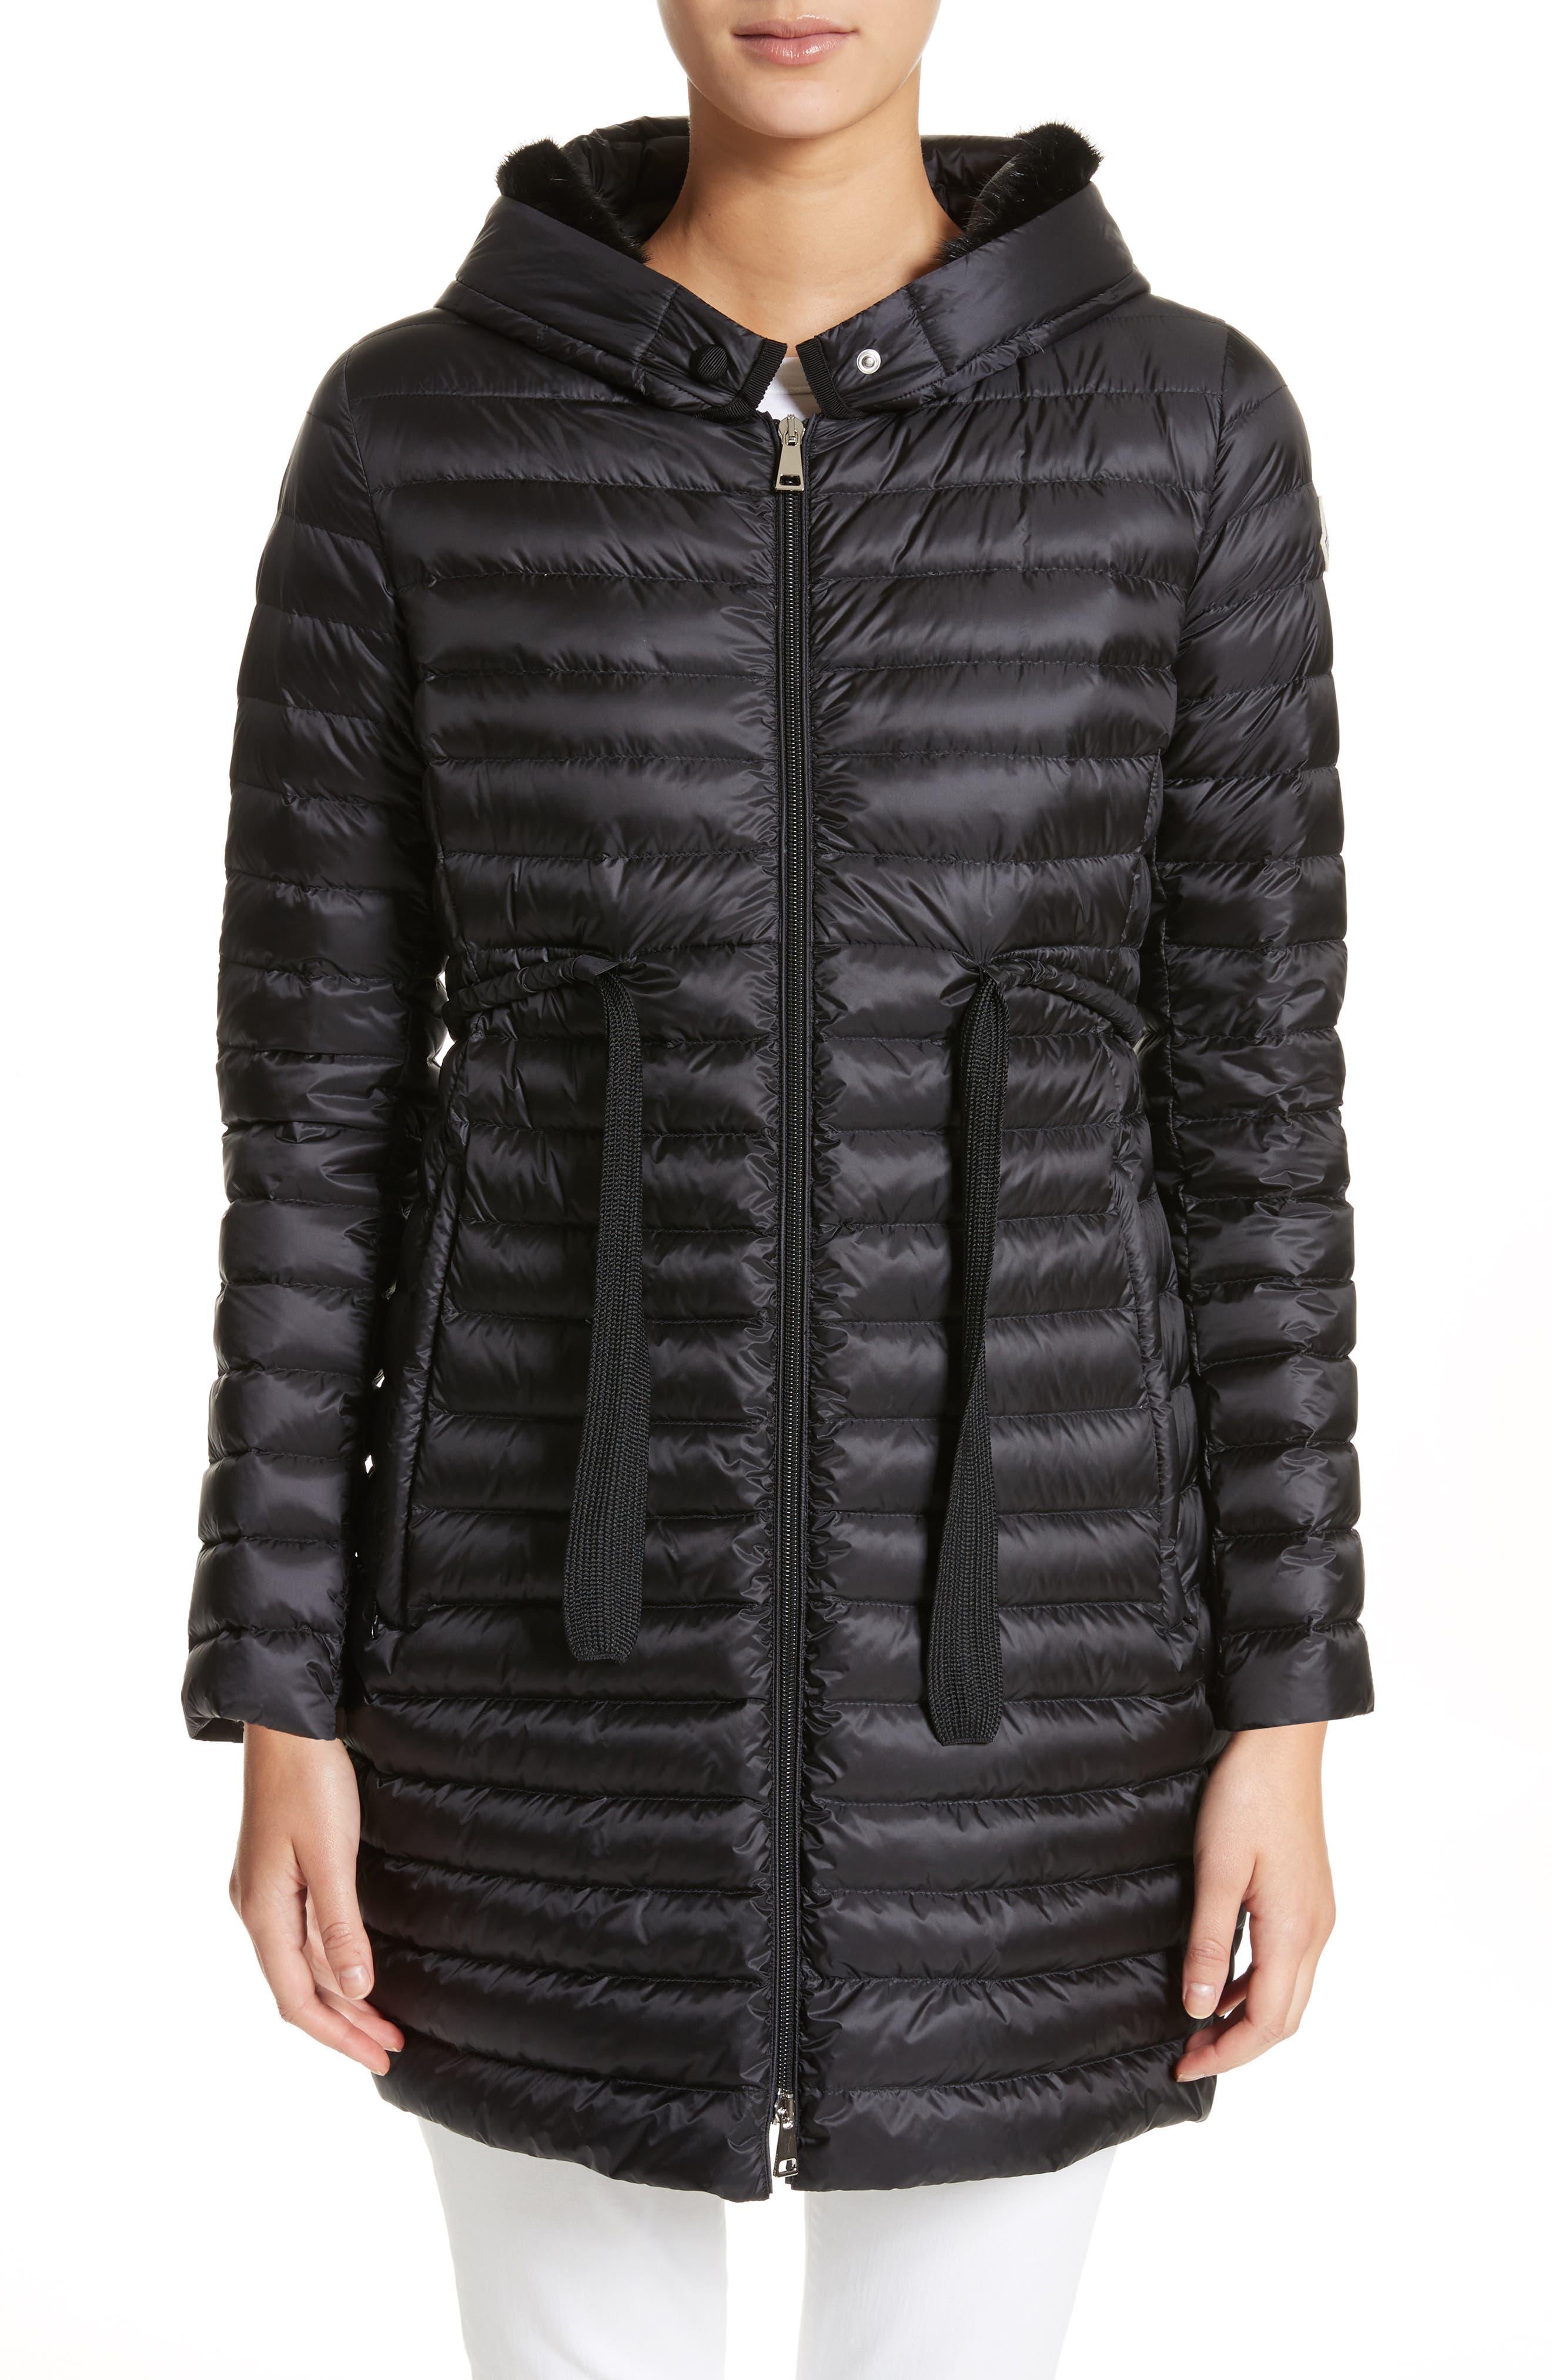 Barbel Hooded Down Coat with Genuine Mink Fur Trim,                             Main thumbnail 1, color,                             001